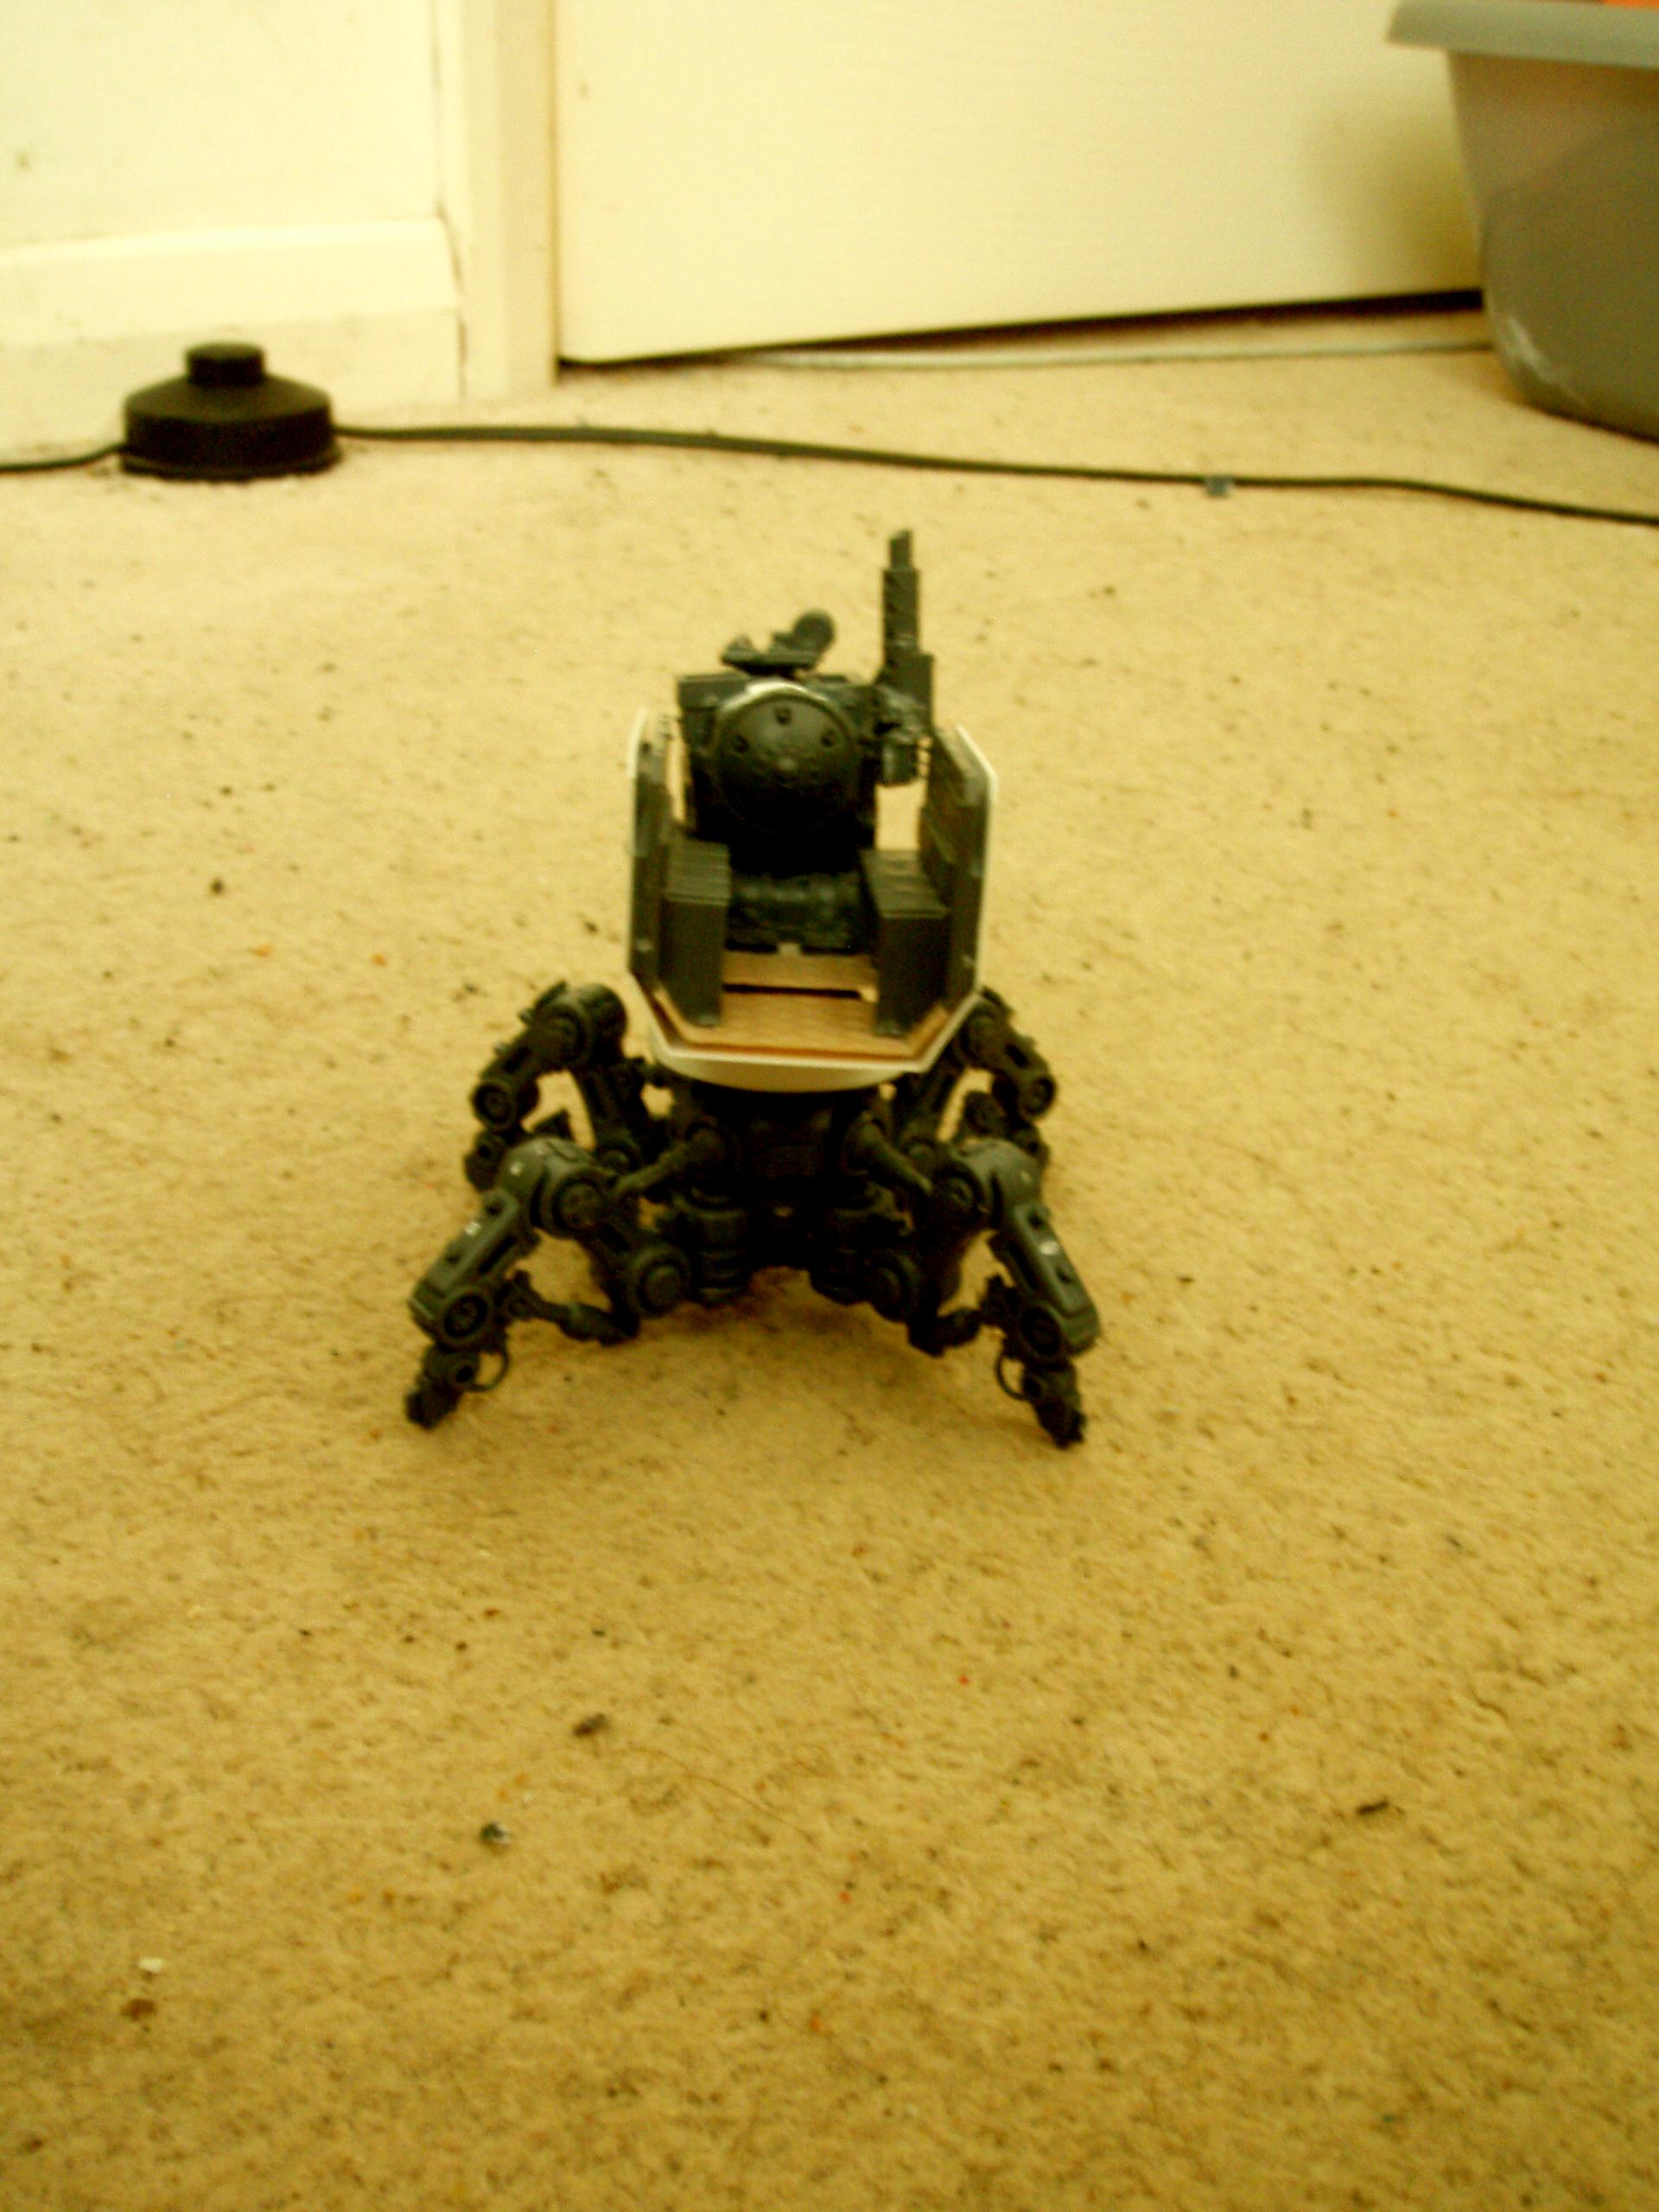 Dunecrawler, M.u.l.e, Mars Universal Land Engine, Mechanicum, Mule, Onager, Onager Dunecrawler, Skitarii